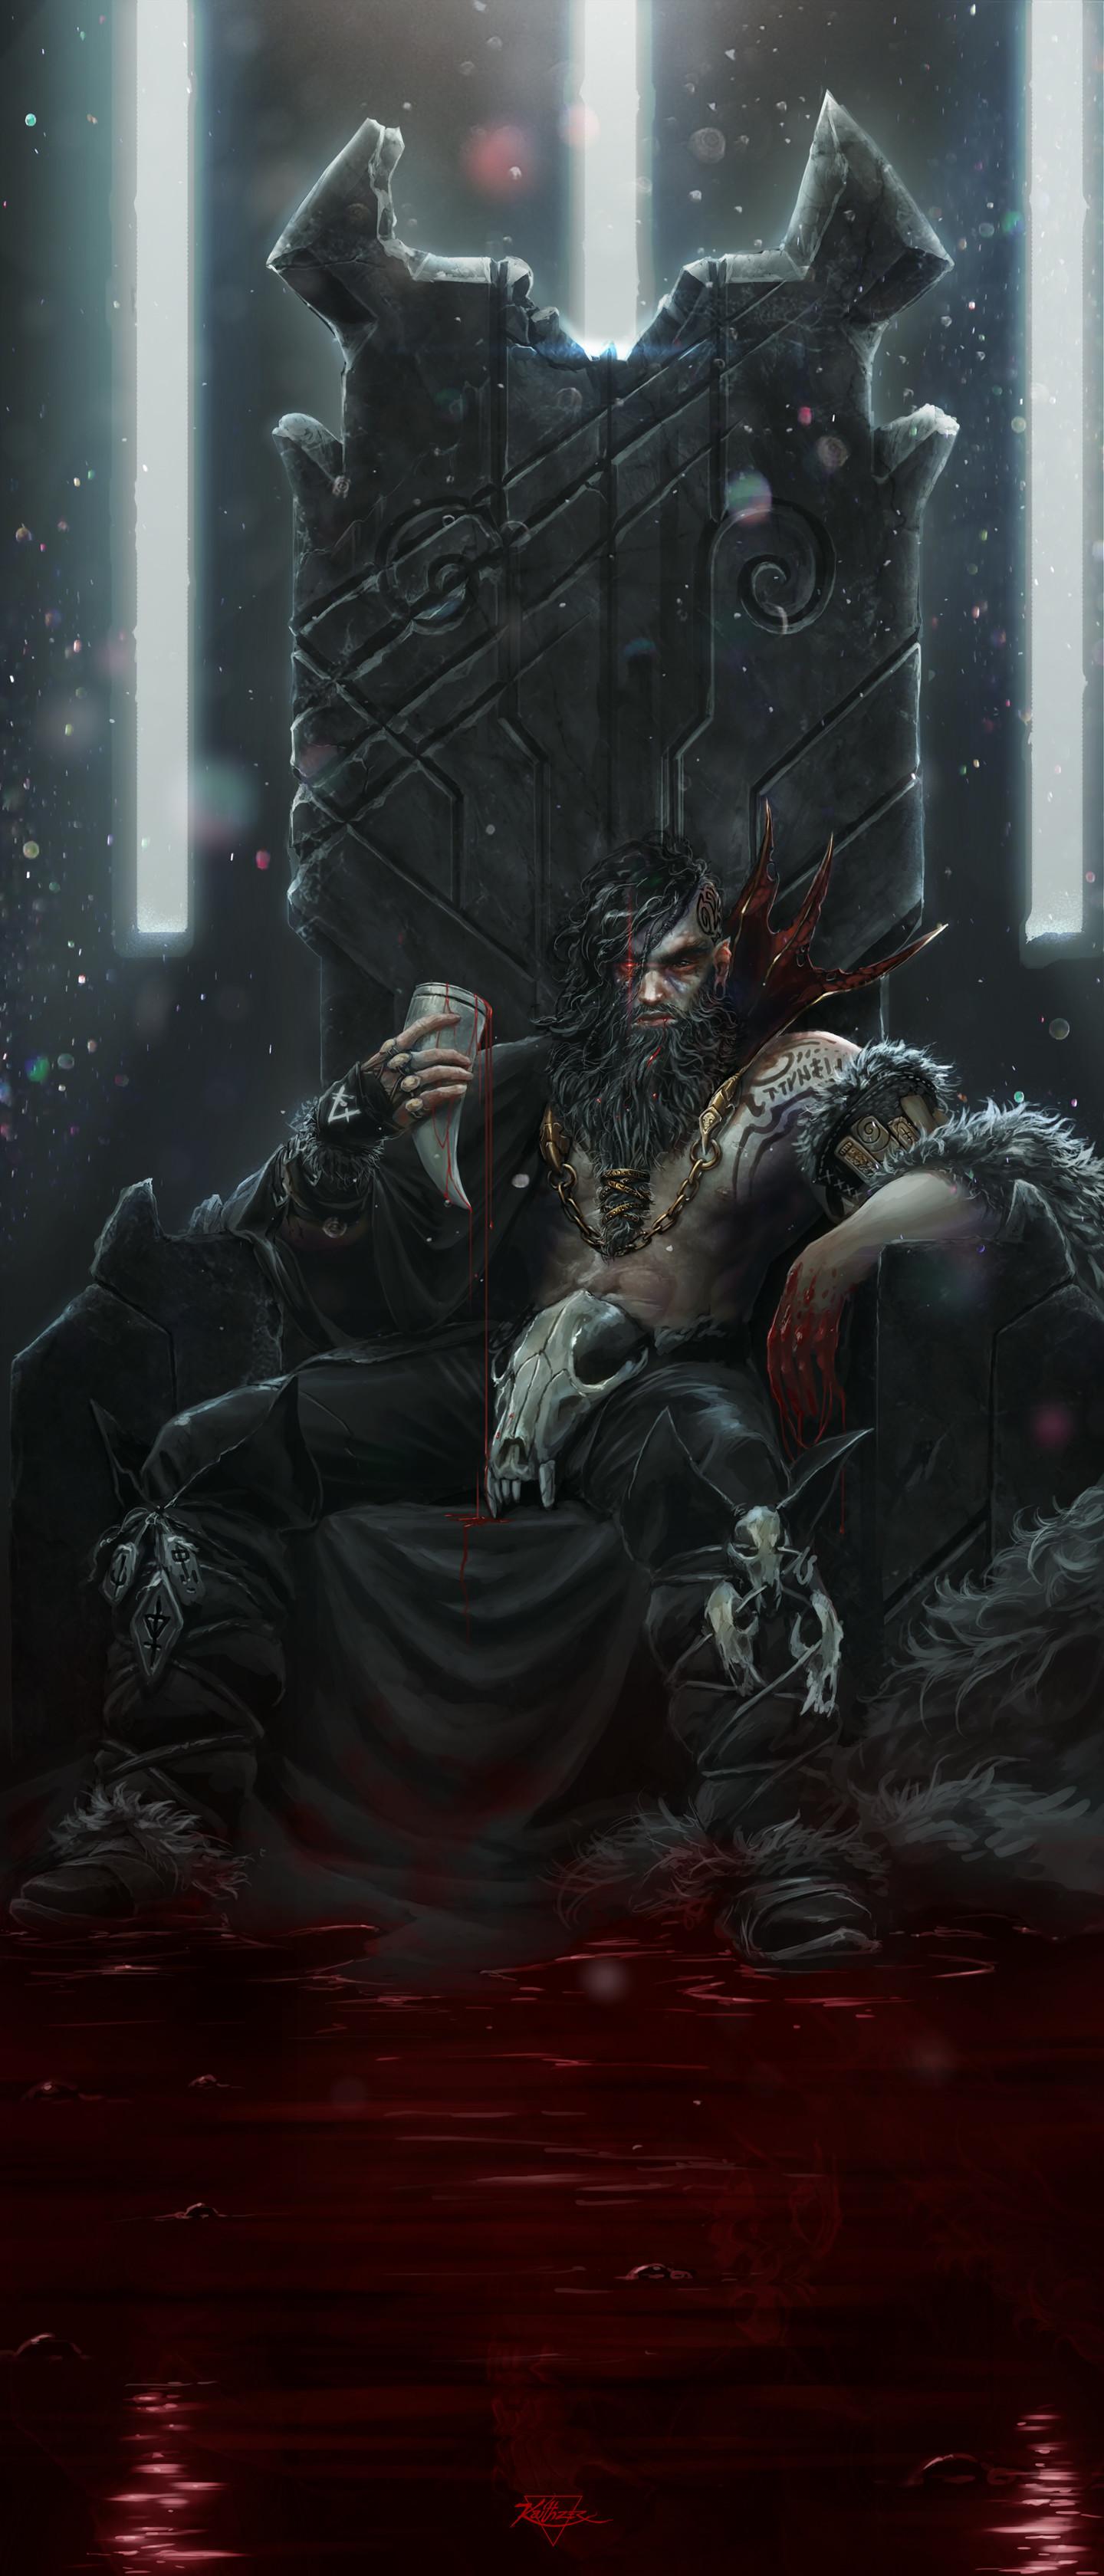 Kaithzer morejon viking lord send